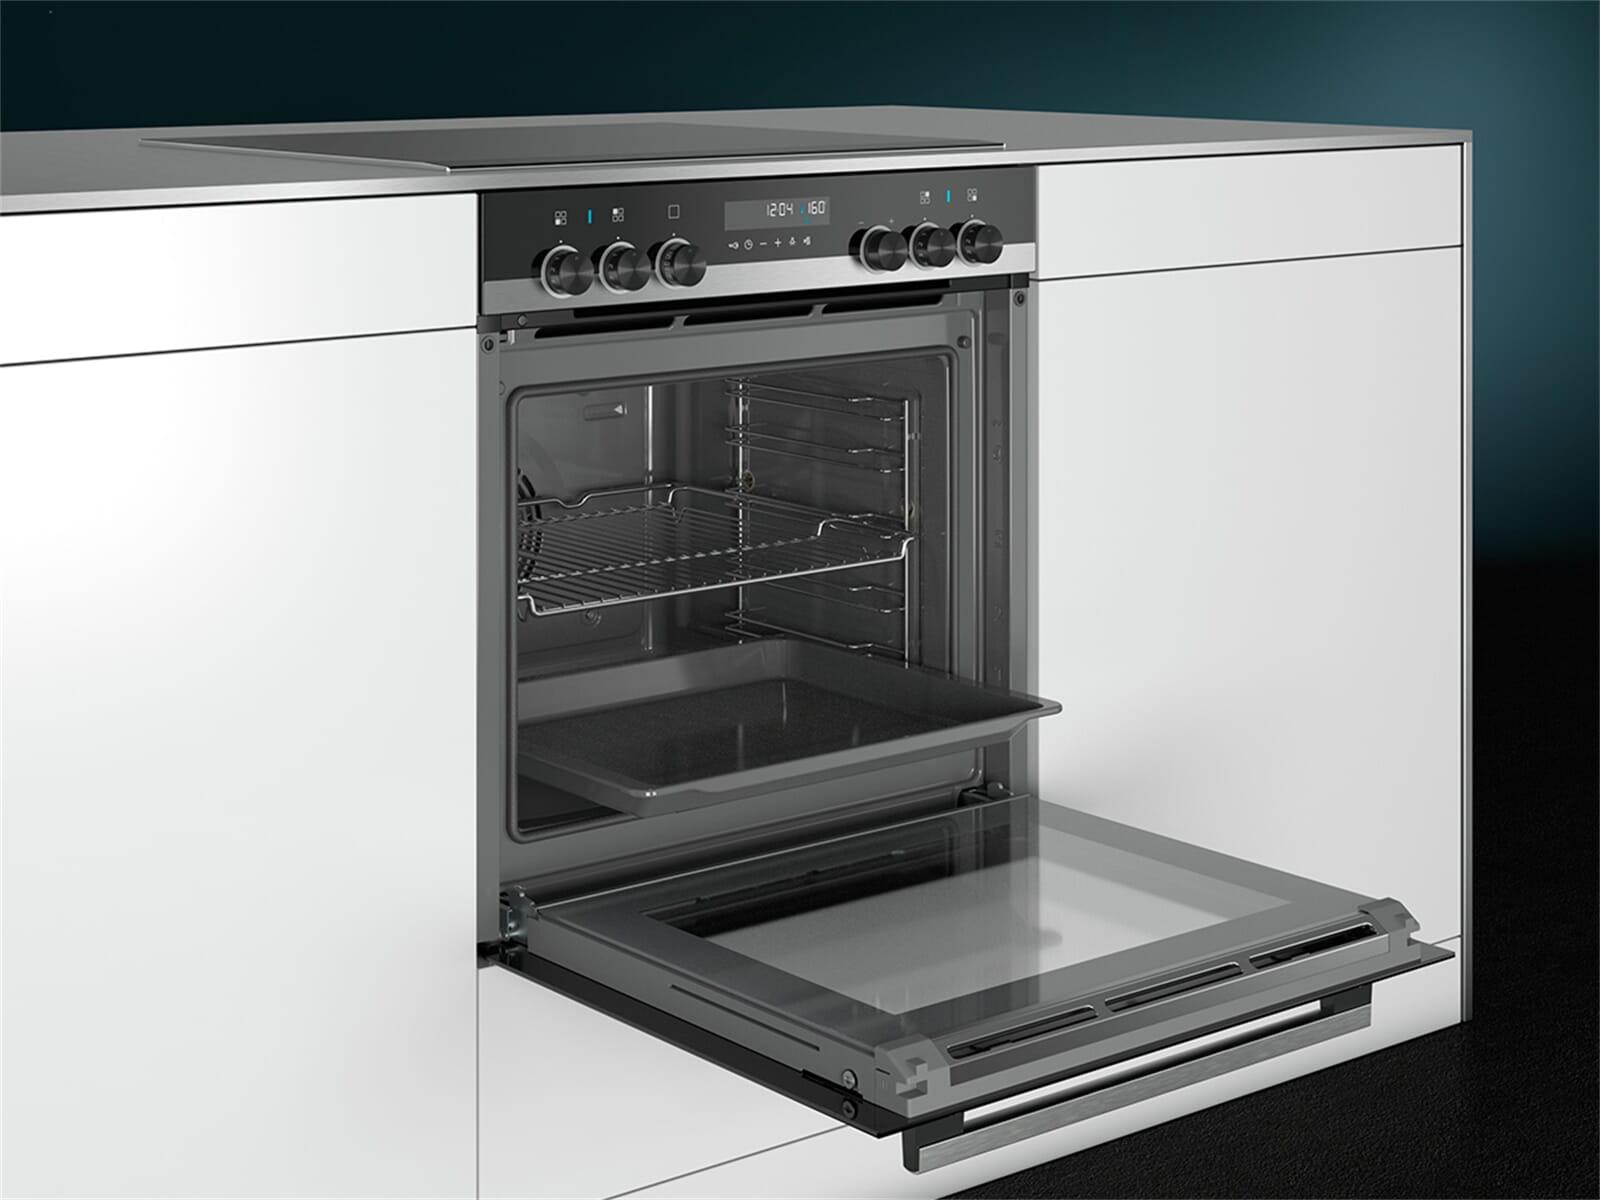 Siemens PQ521KA00 Set Einbauherd HE578ABS0 + Glaskeramikkochfeld EA645GN17